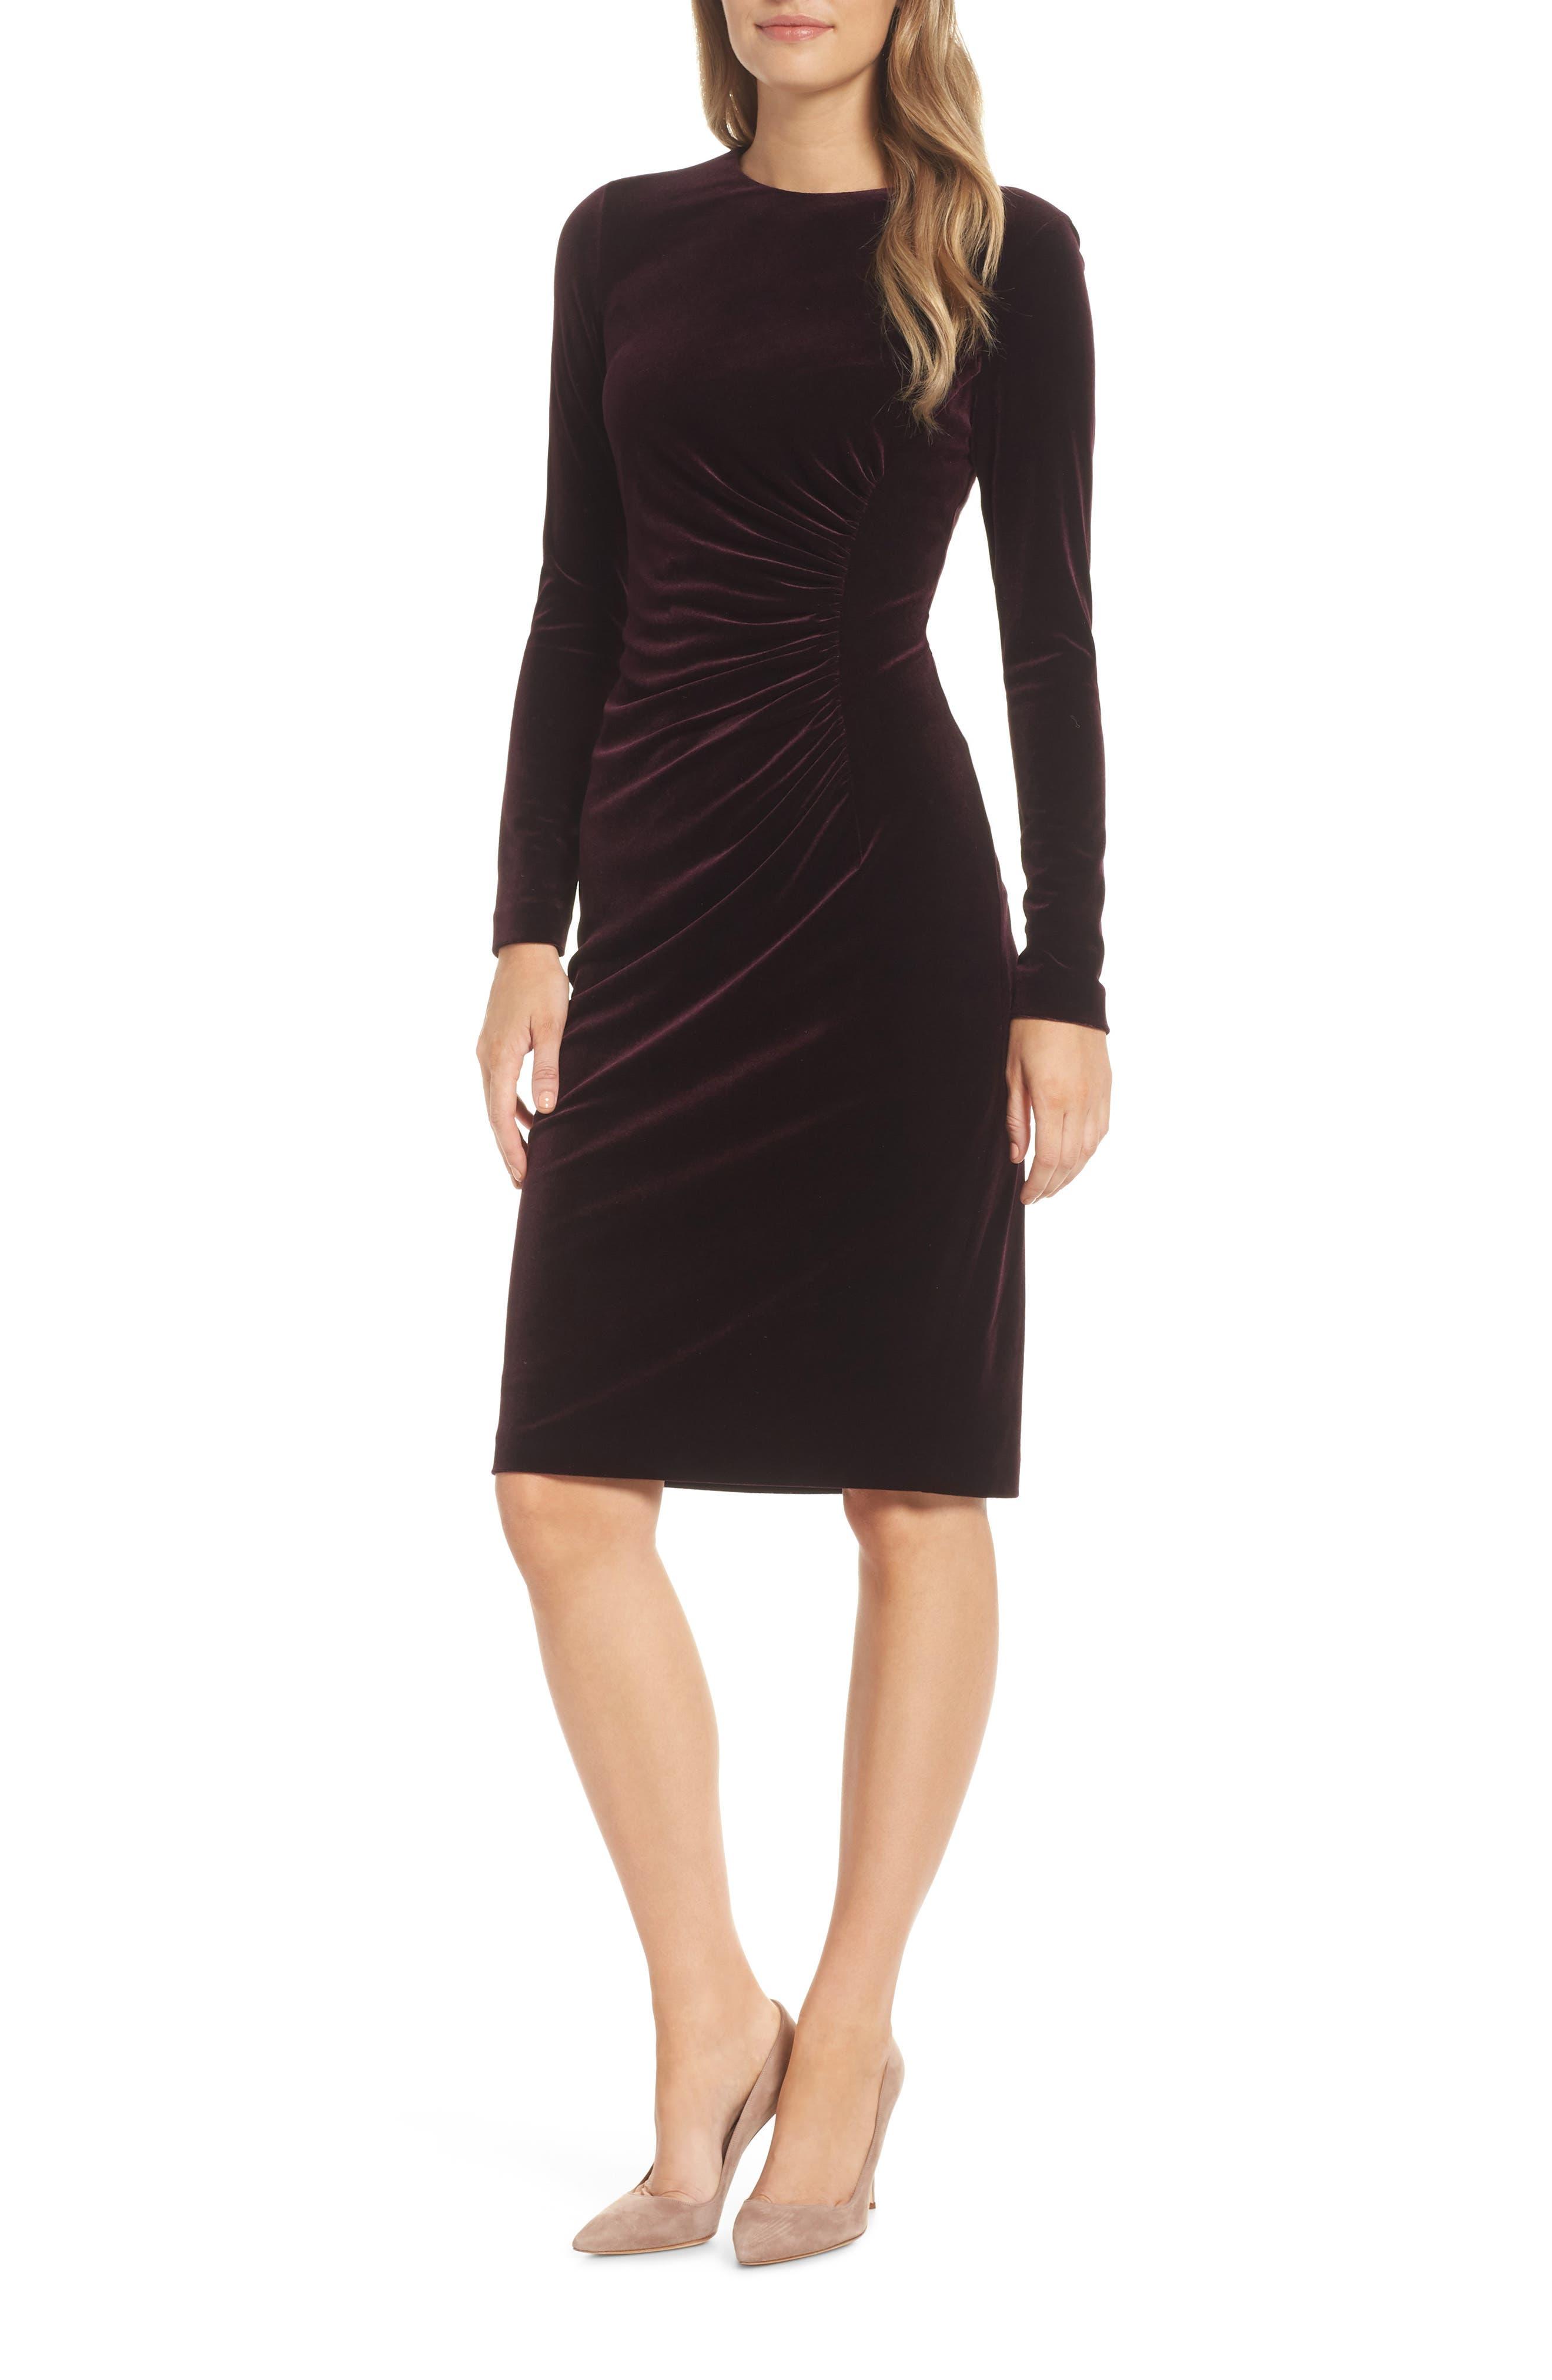 Petite Harper Rose Long Sleeve Body-Con Dress, Burgundy